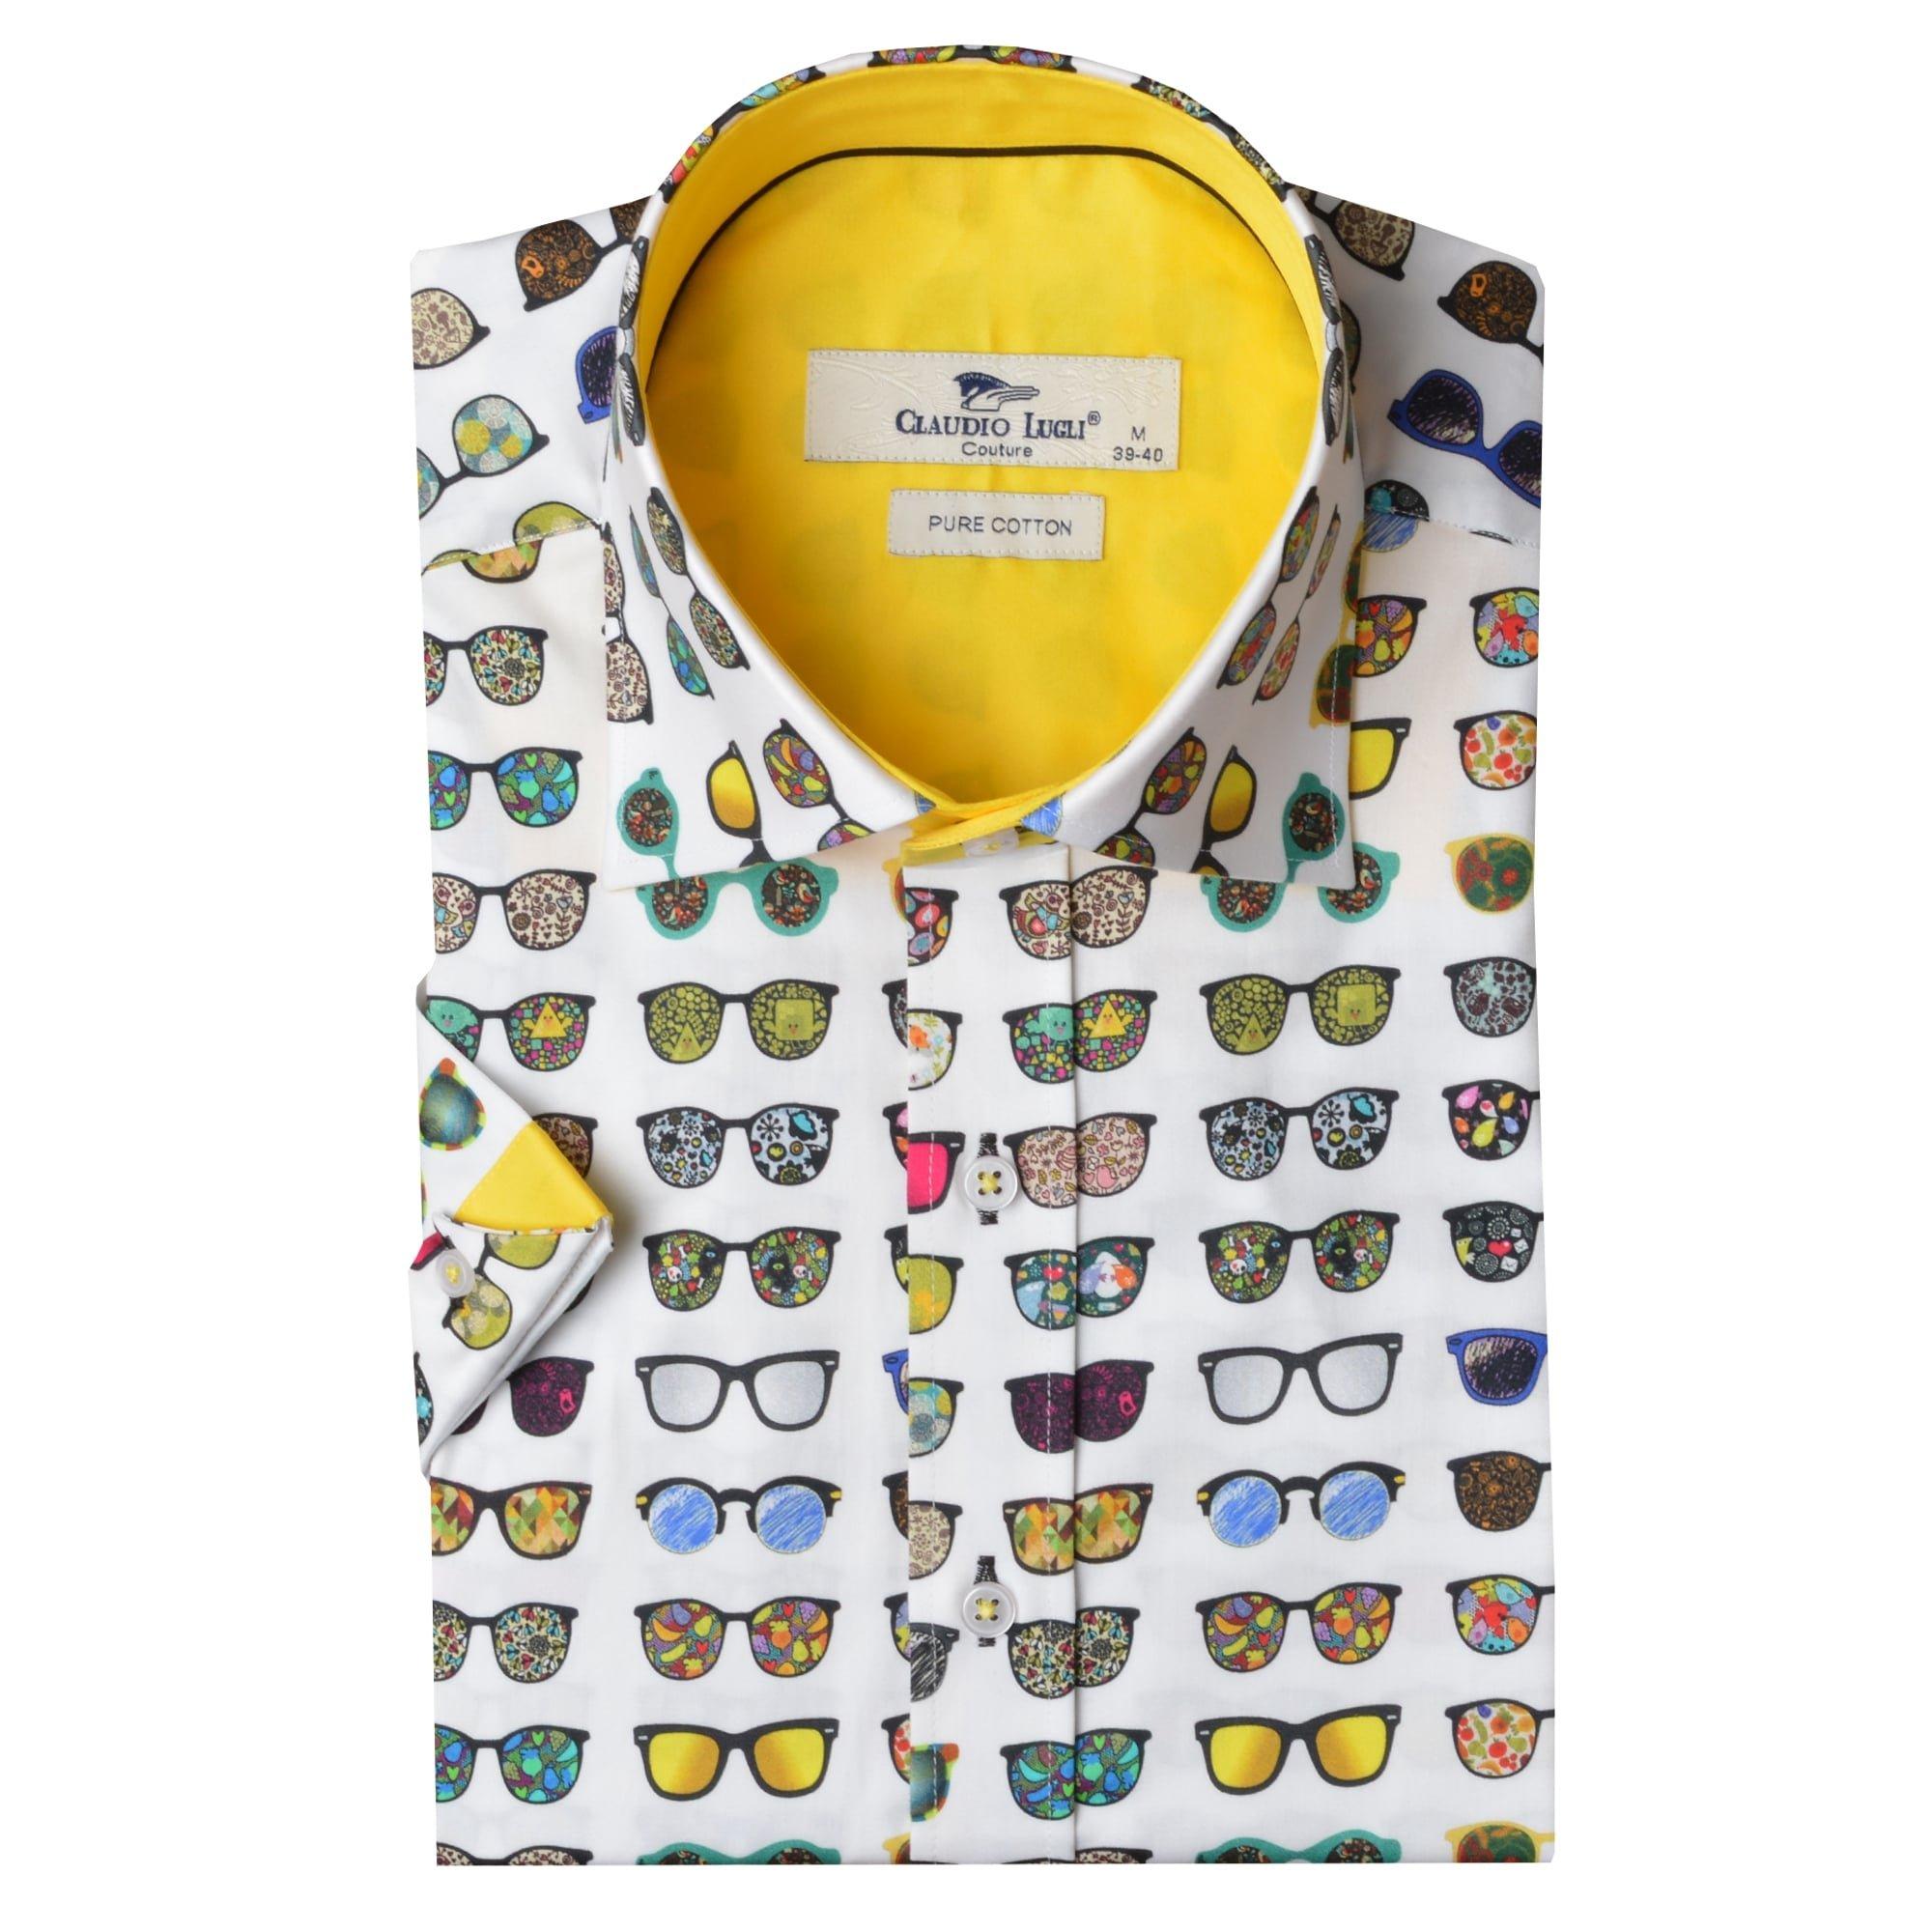 Claudio Lugli Men's Sunglasses Print Luxury Cotton Short Sleeve Summer Mens Shirt CP6251 Medium White, Yellow, Multi